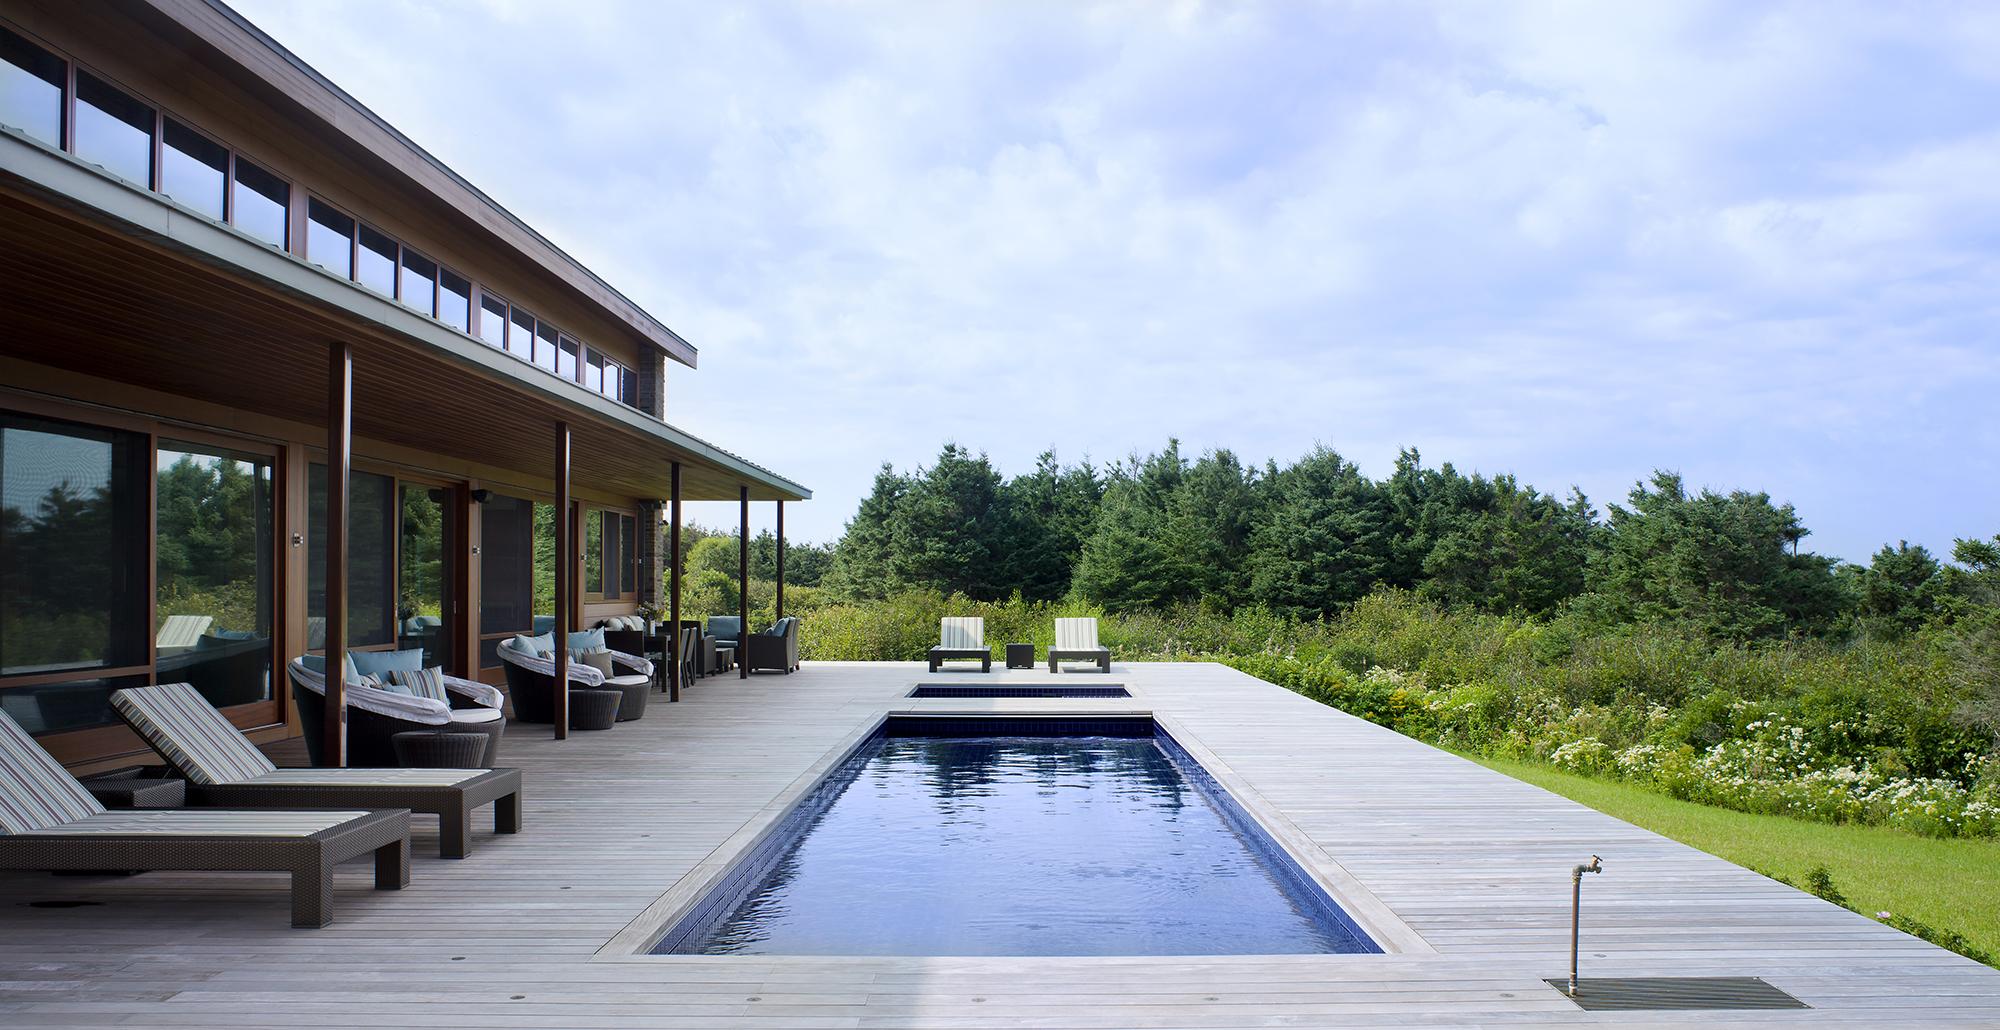 Pool  Prince Edward Island, CA